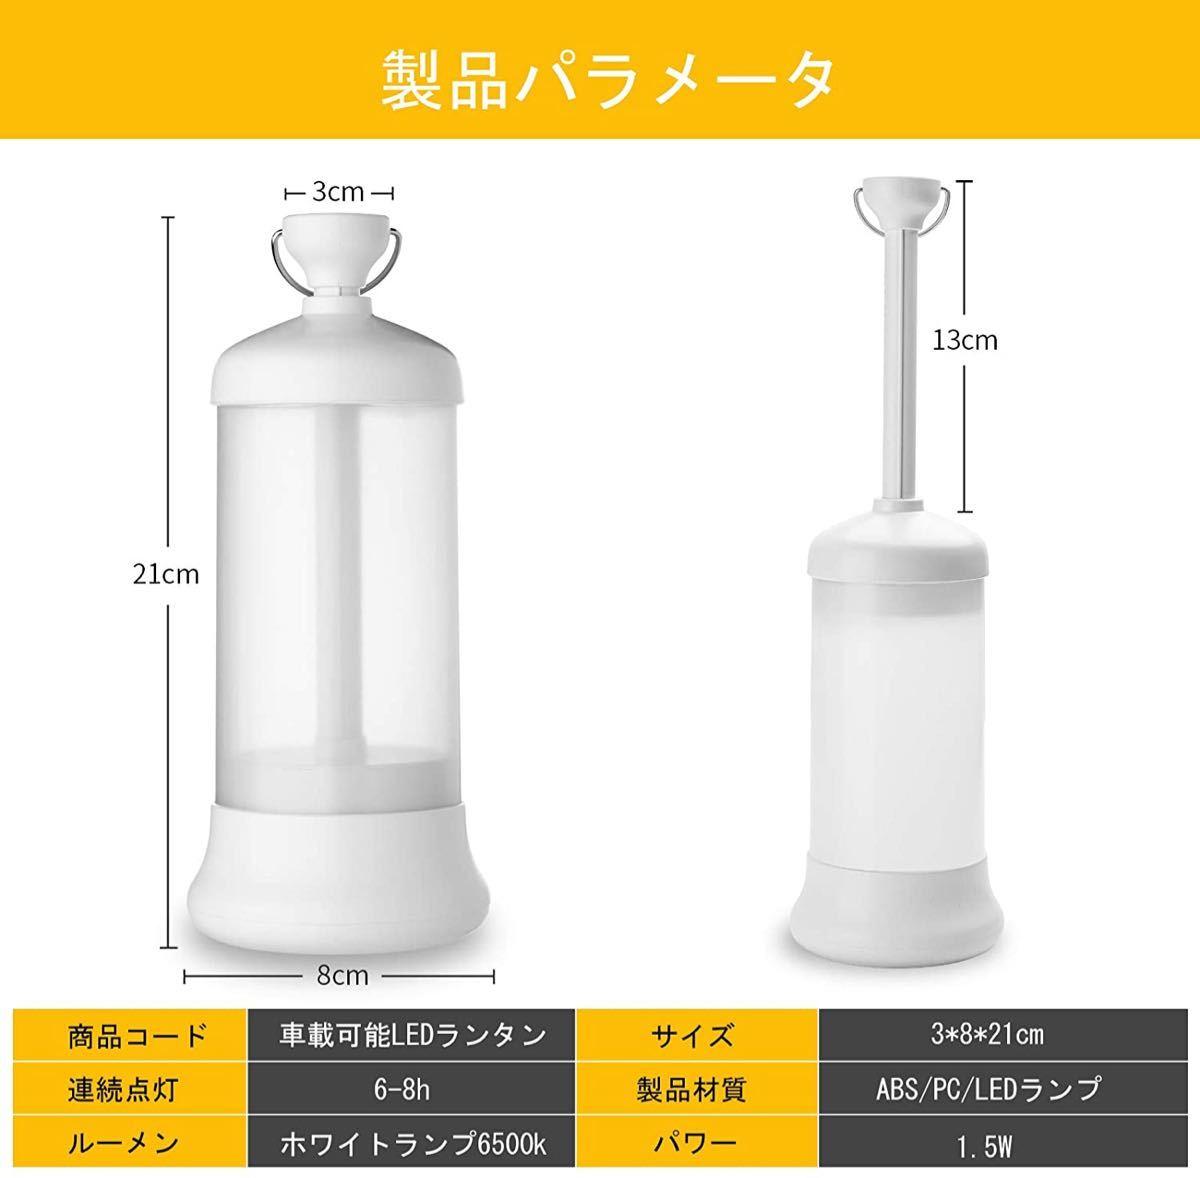 LEDランタン充電式 4つ点灯モード 無段階調光調色 強力磁石内蔵 防水防塵機能